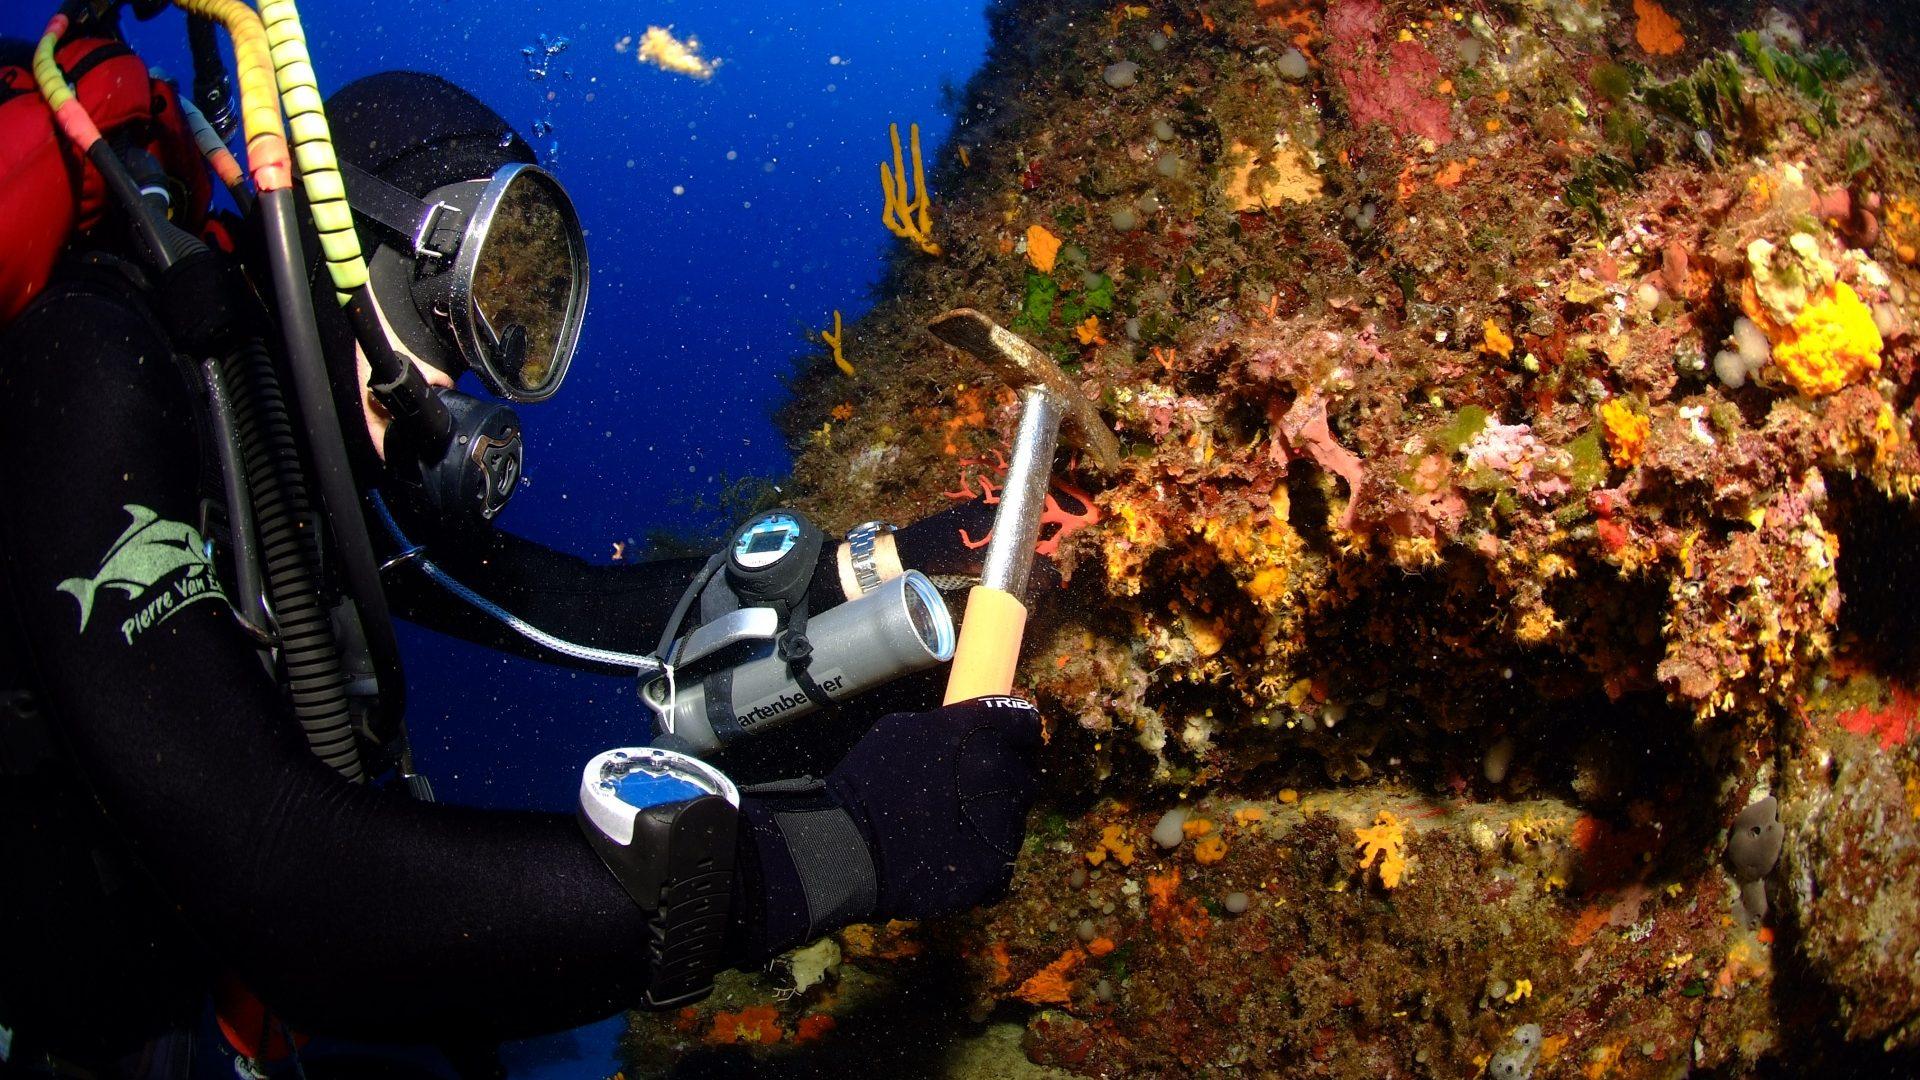 Corail rouge de Bonifacio